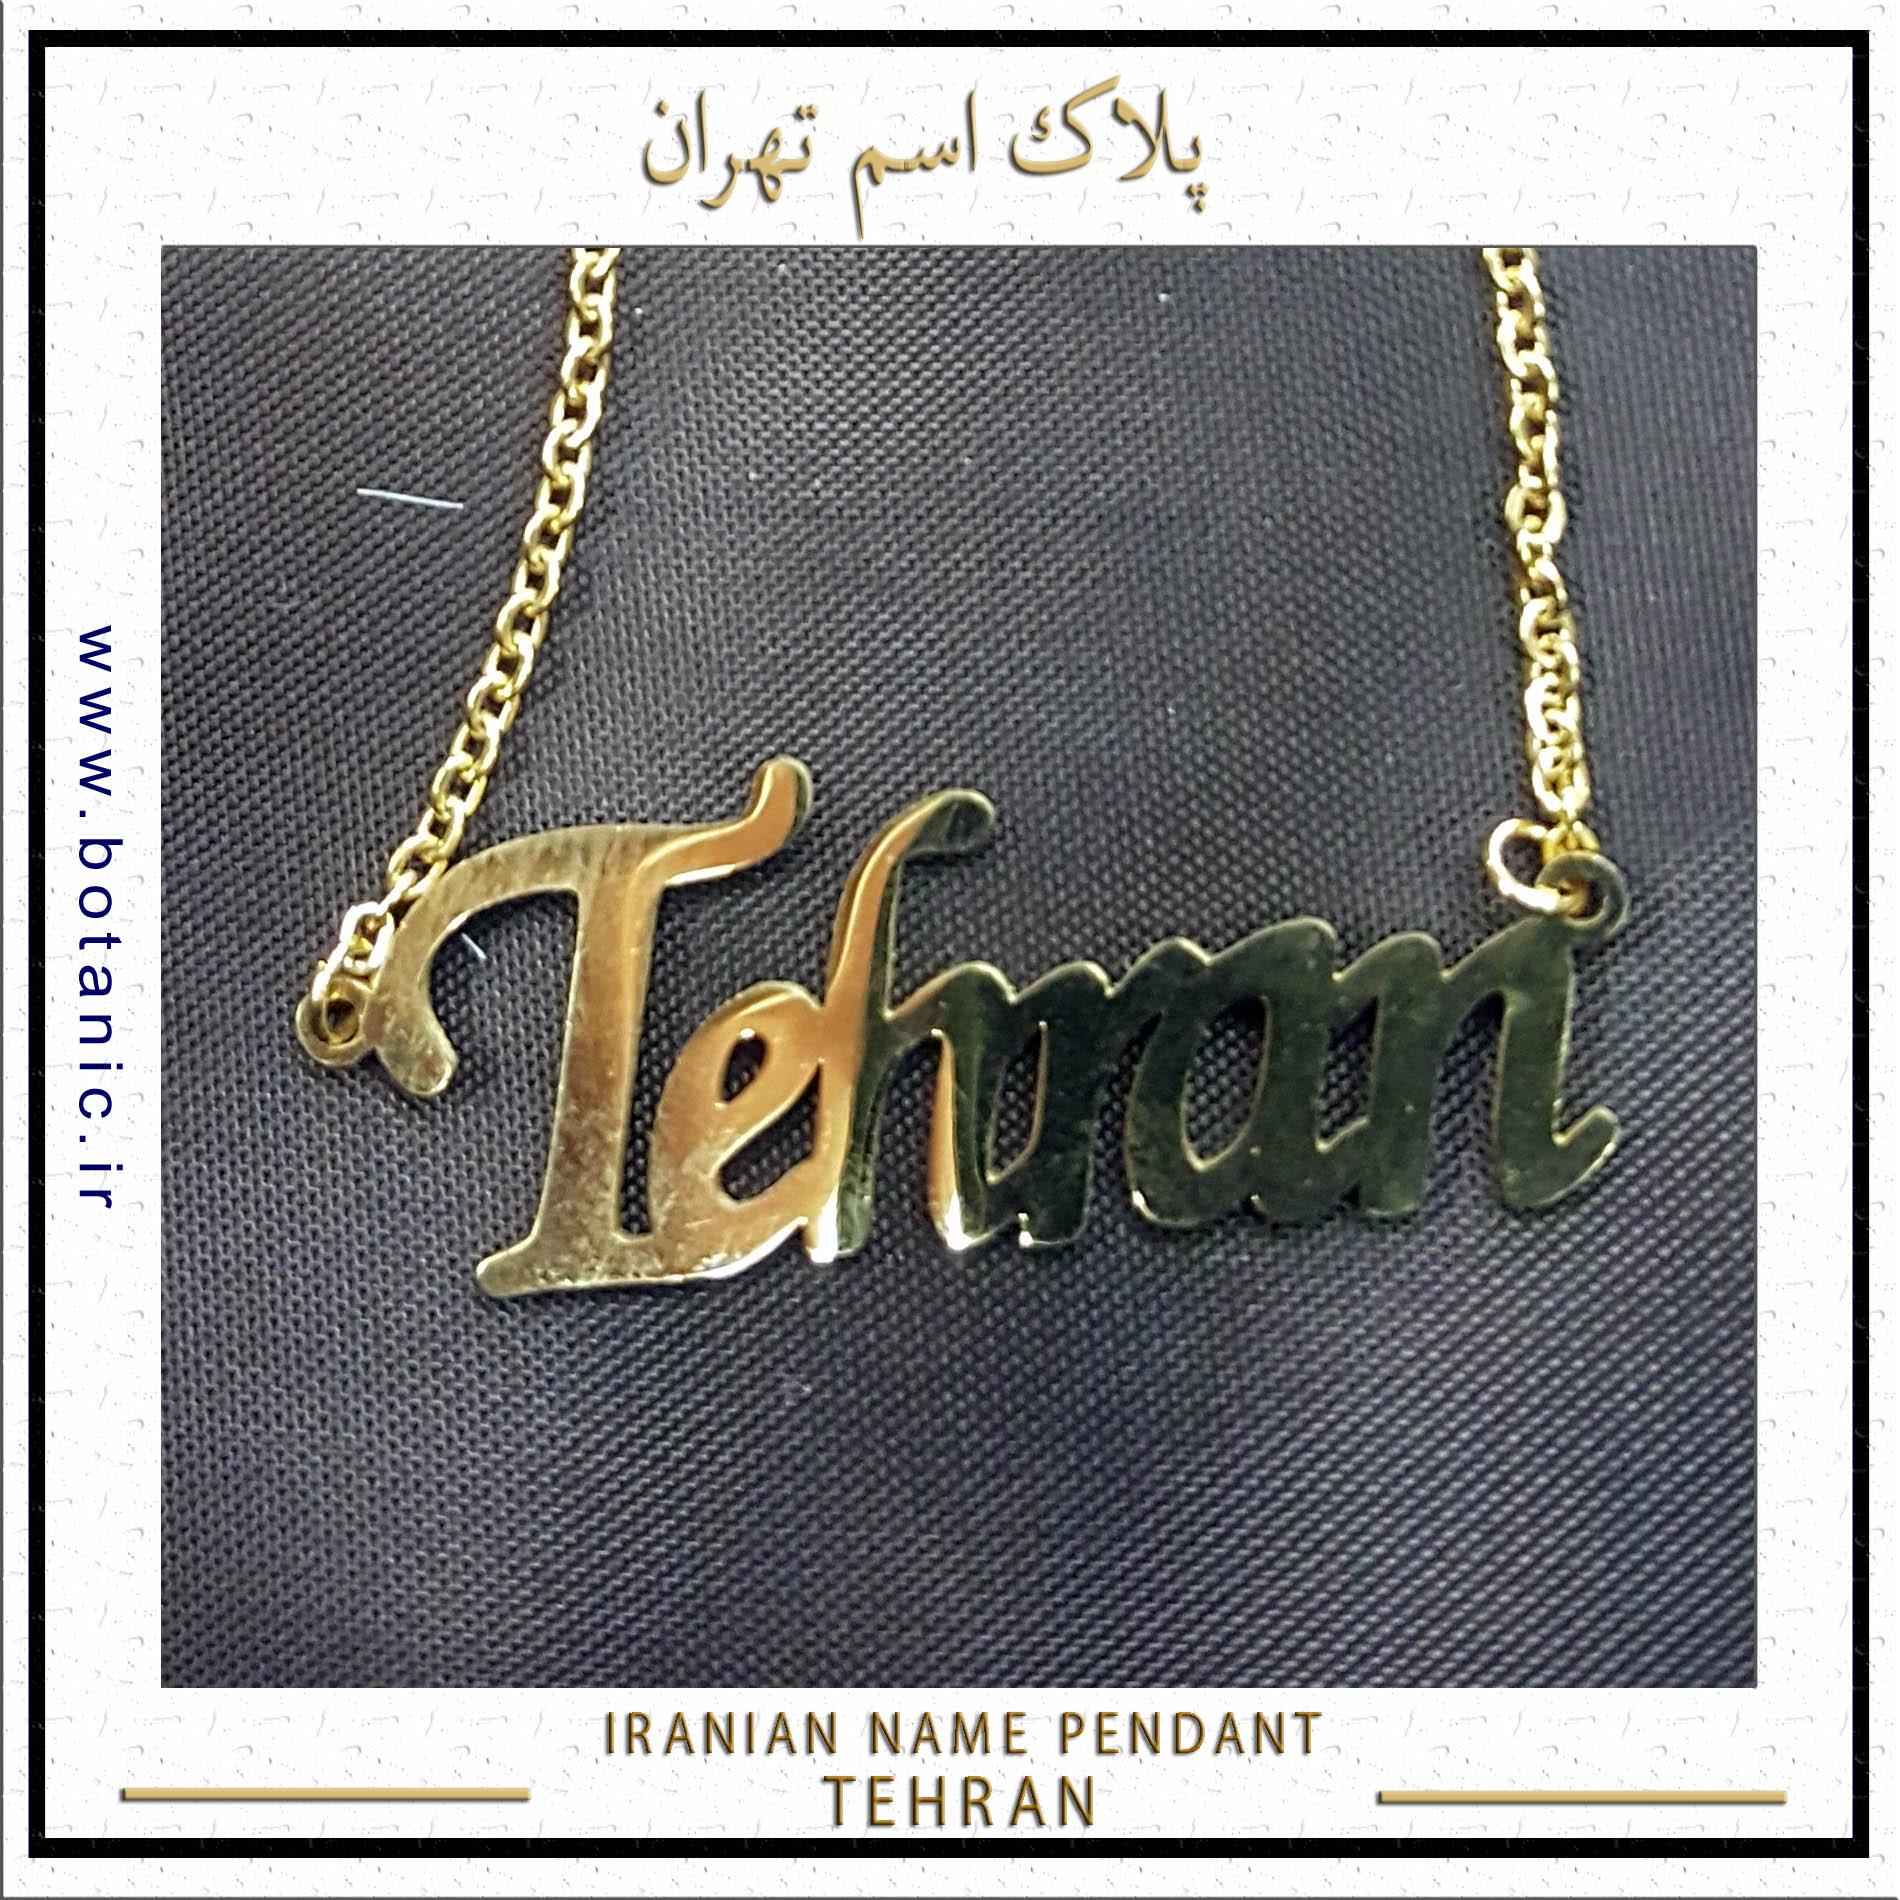 Iranian Name Pendant Tehran